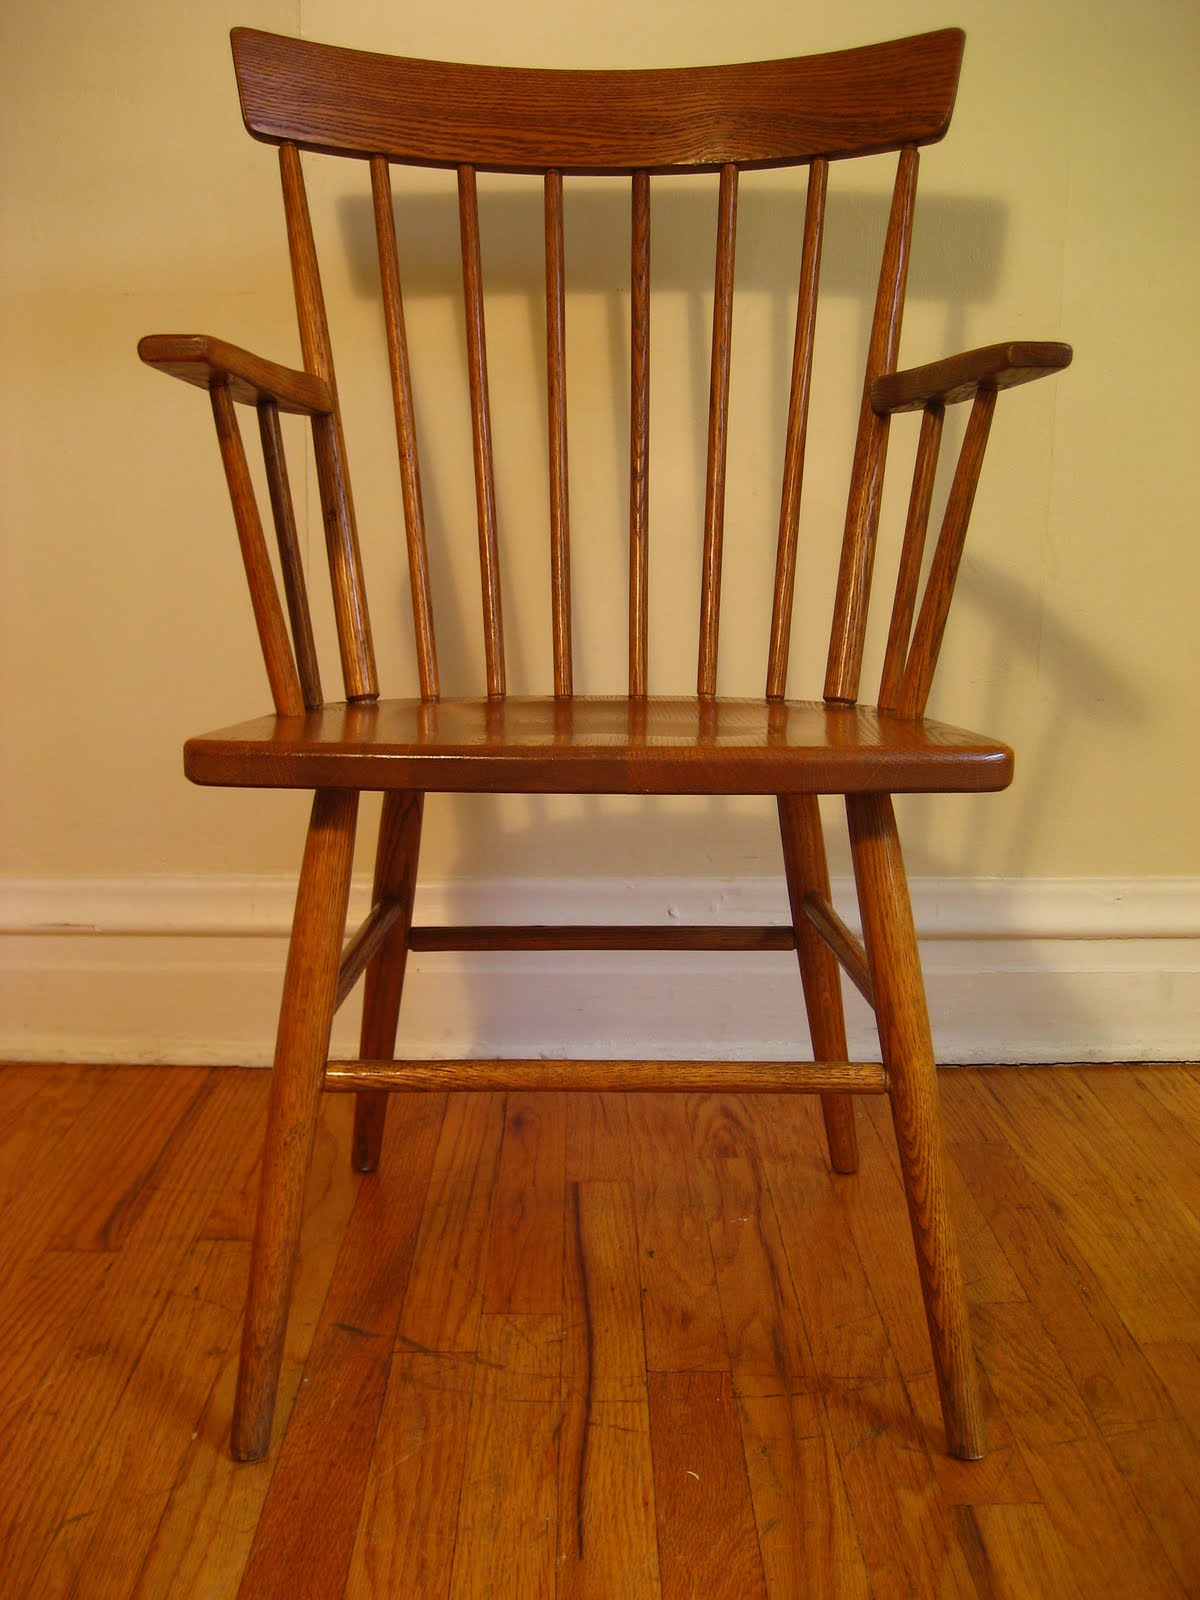 Conant Ball Chair Outdoor Wrought Iron Cushions Flatout Design Chairs